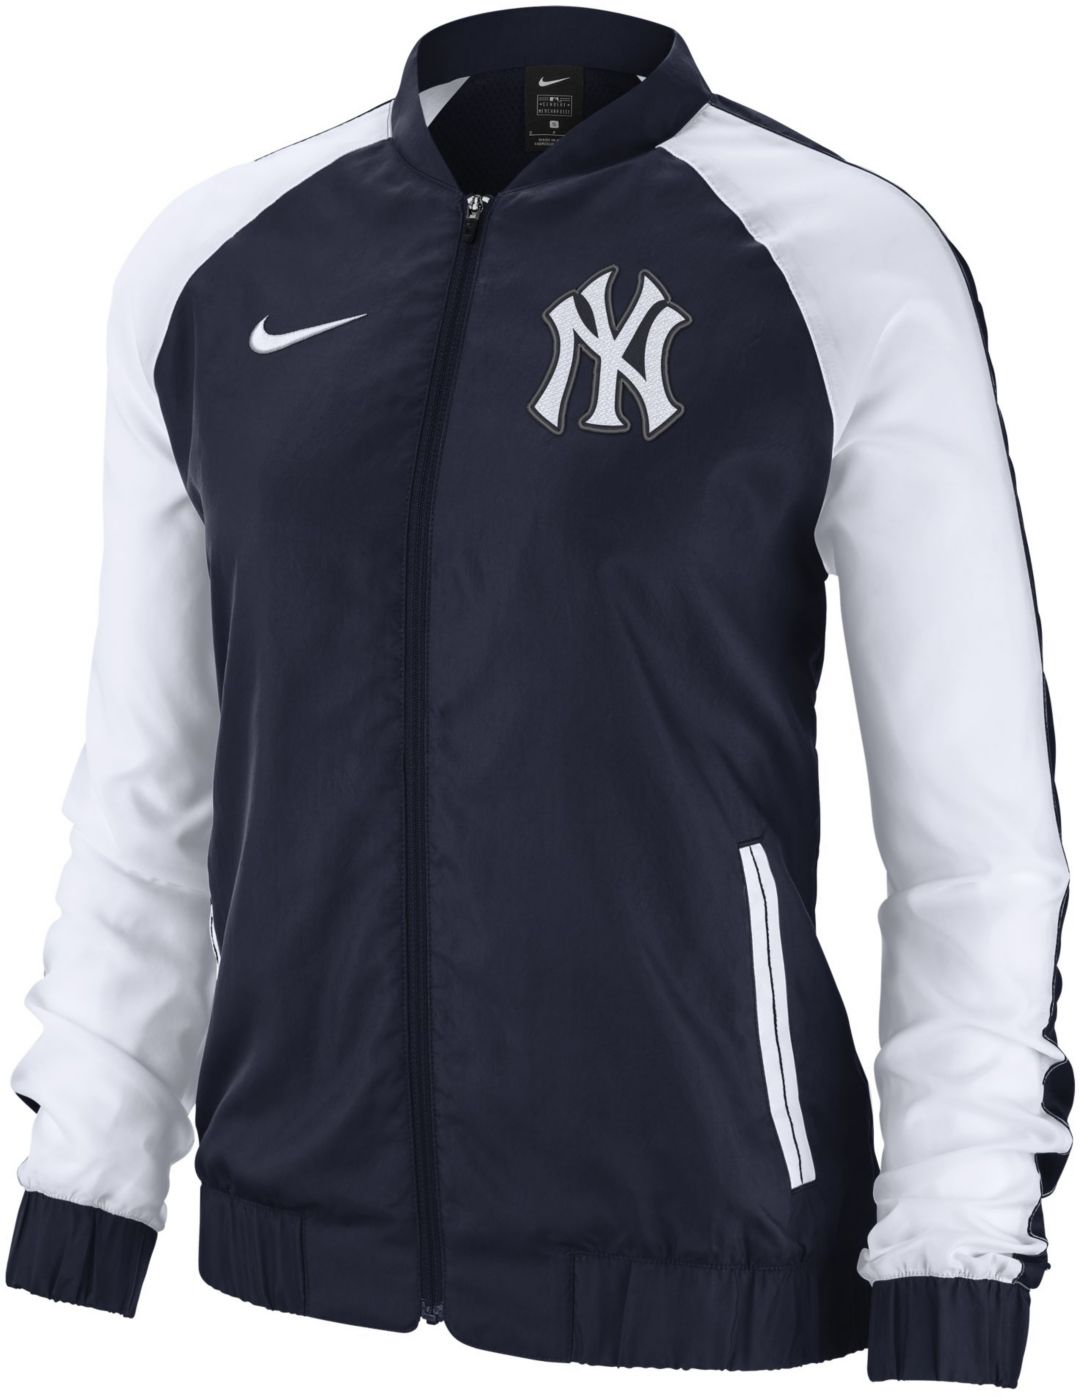 Nike Women's New York Yankees Dri FIT Full Zip Varsity Jacket